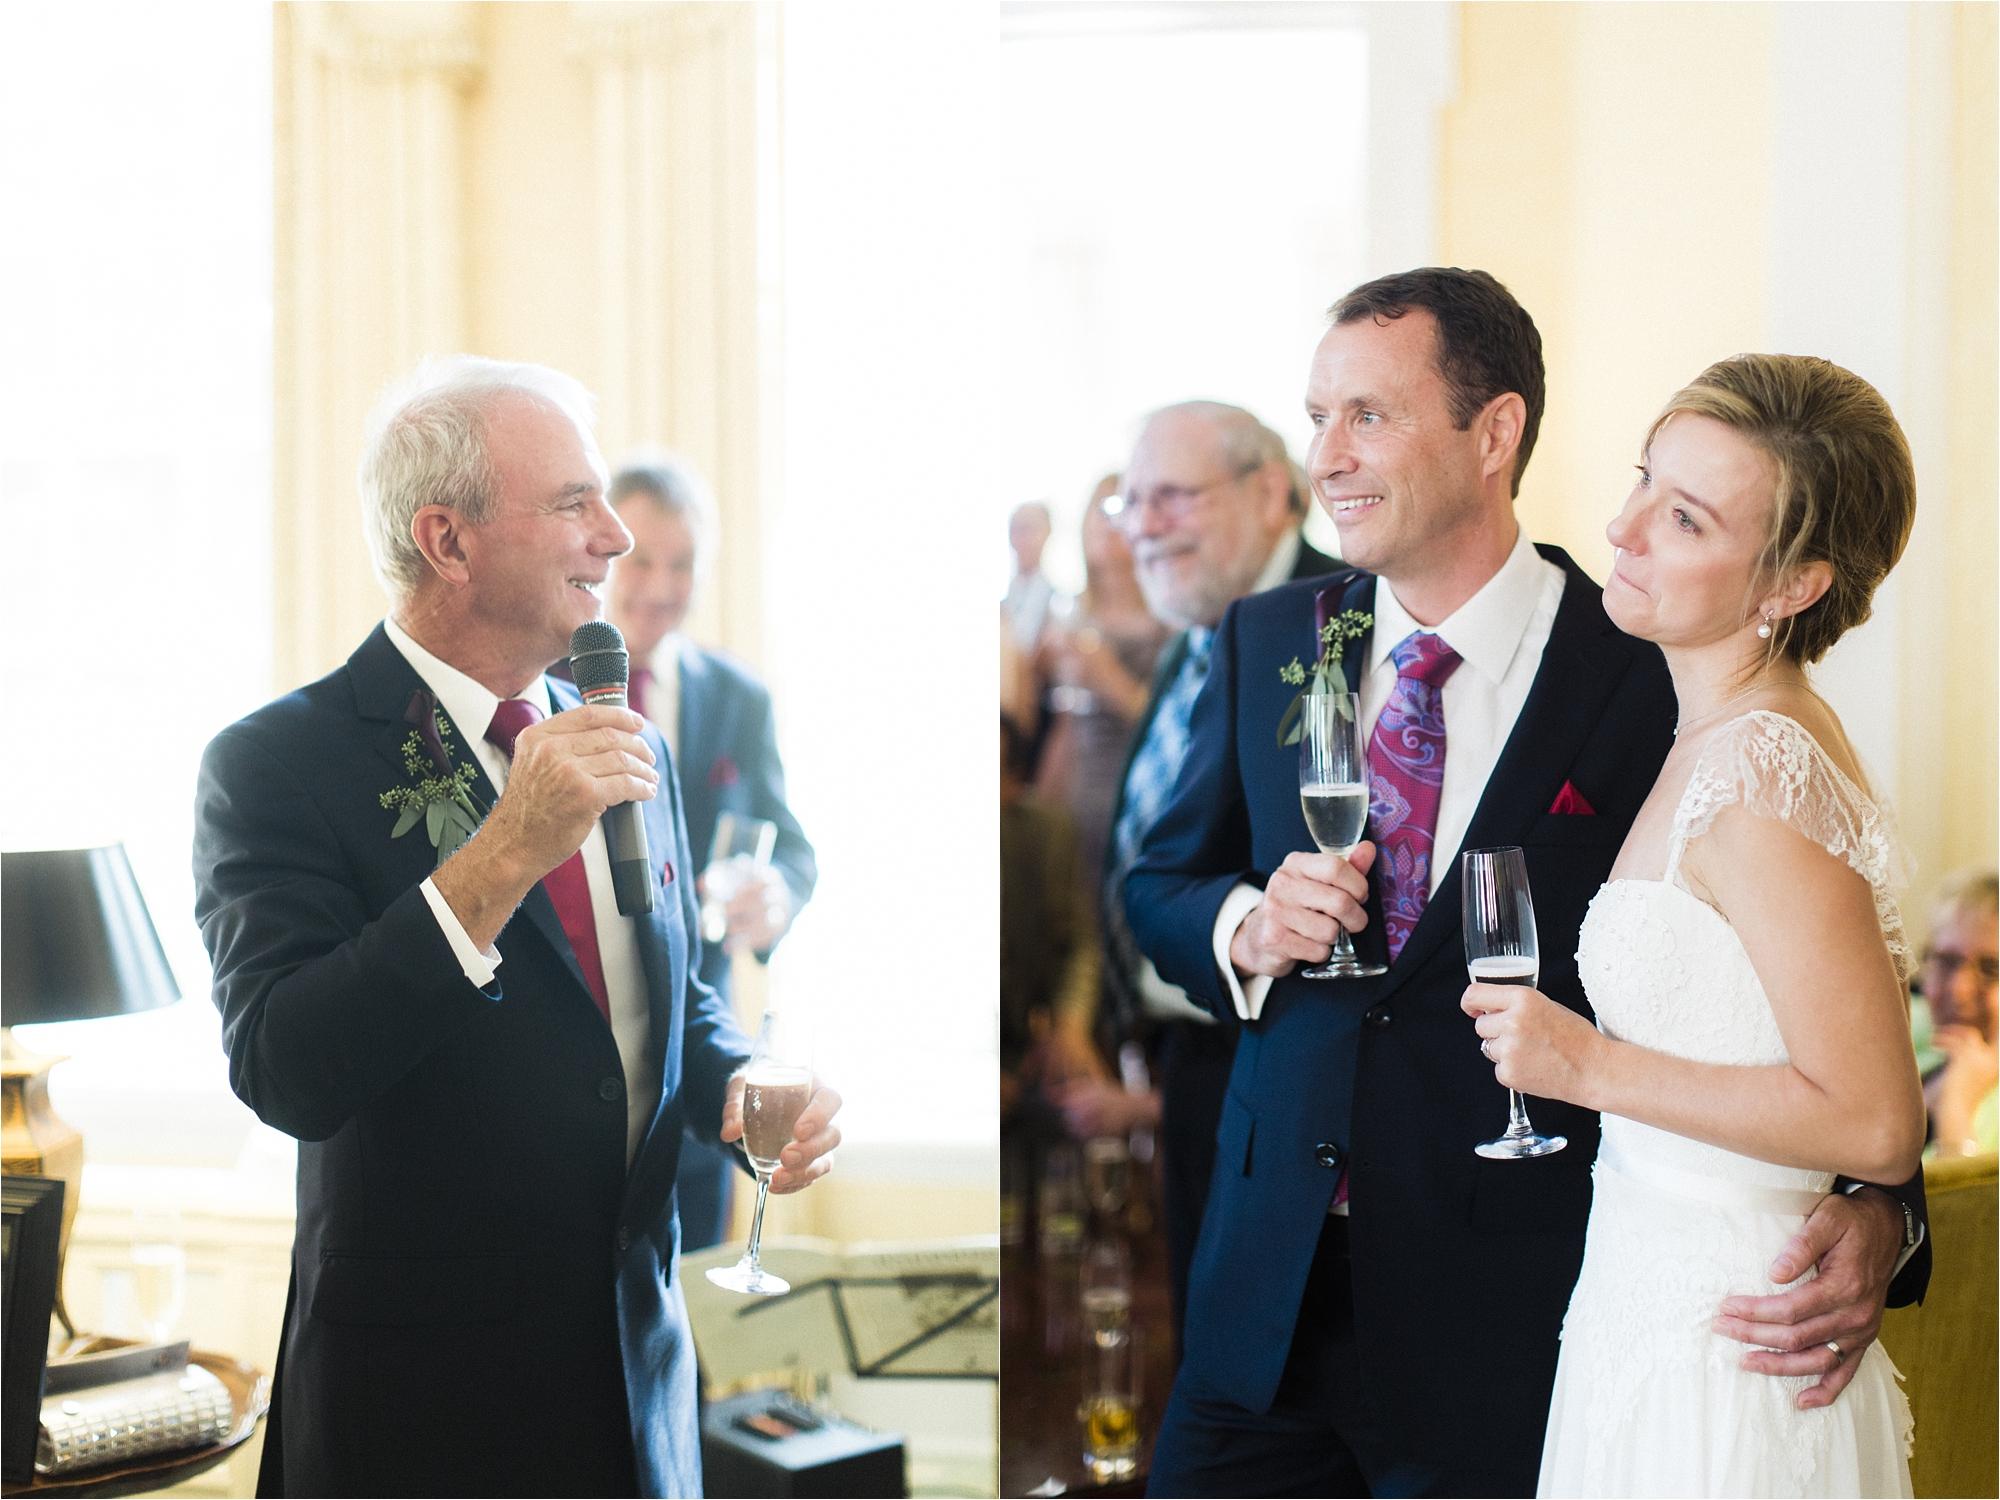 stephanie-yonce-photography-elegant-private-club-washington-dc-wedding-photos_0043.jpg